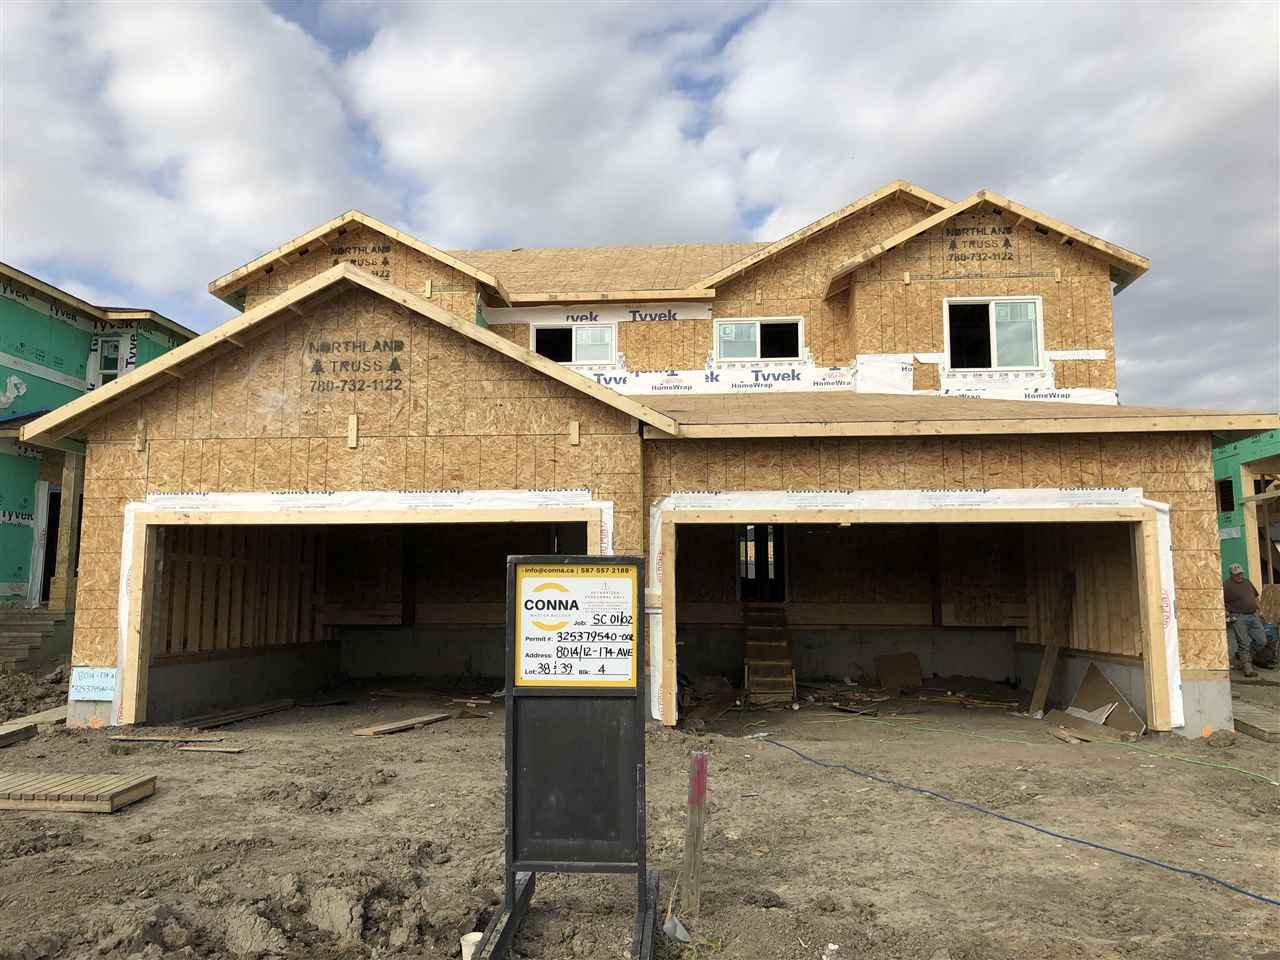 Main Photo: 8014 174 Avenue NW in Edmonton: Zone 28 House Half Duplex for sale : MLS®# E4173904